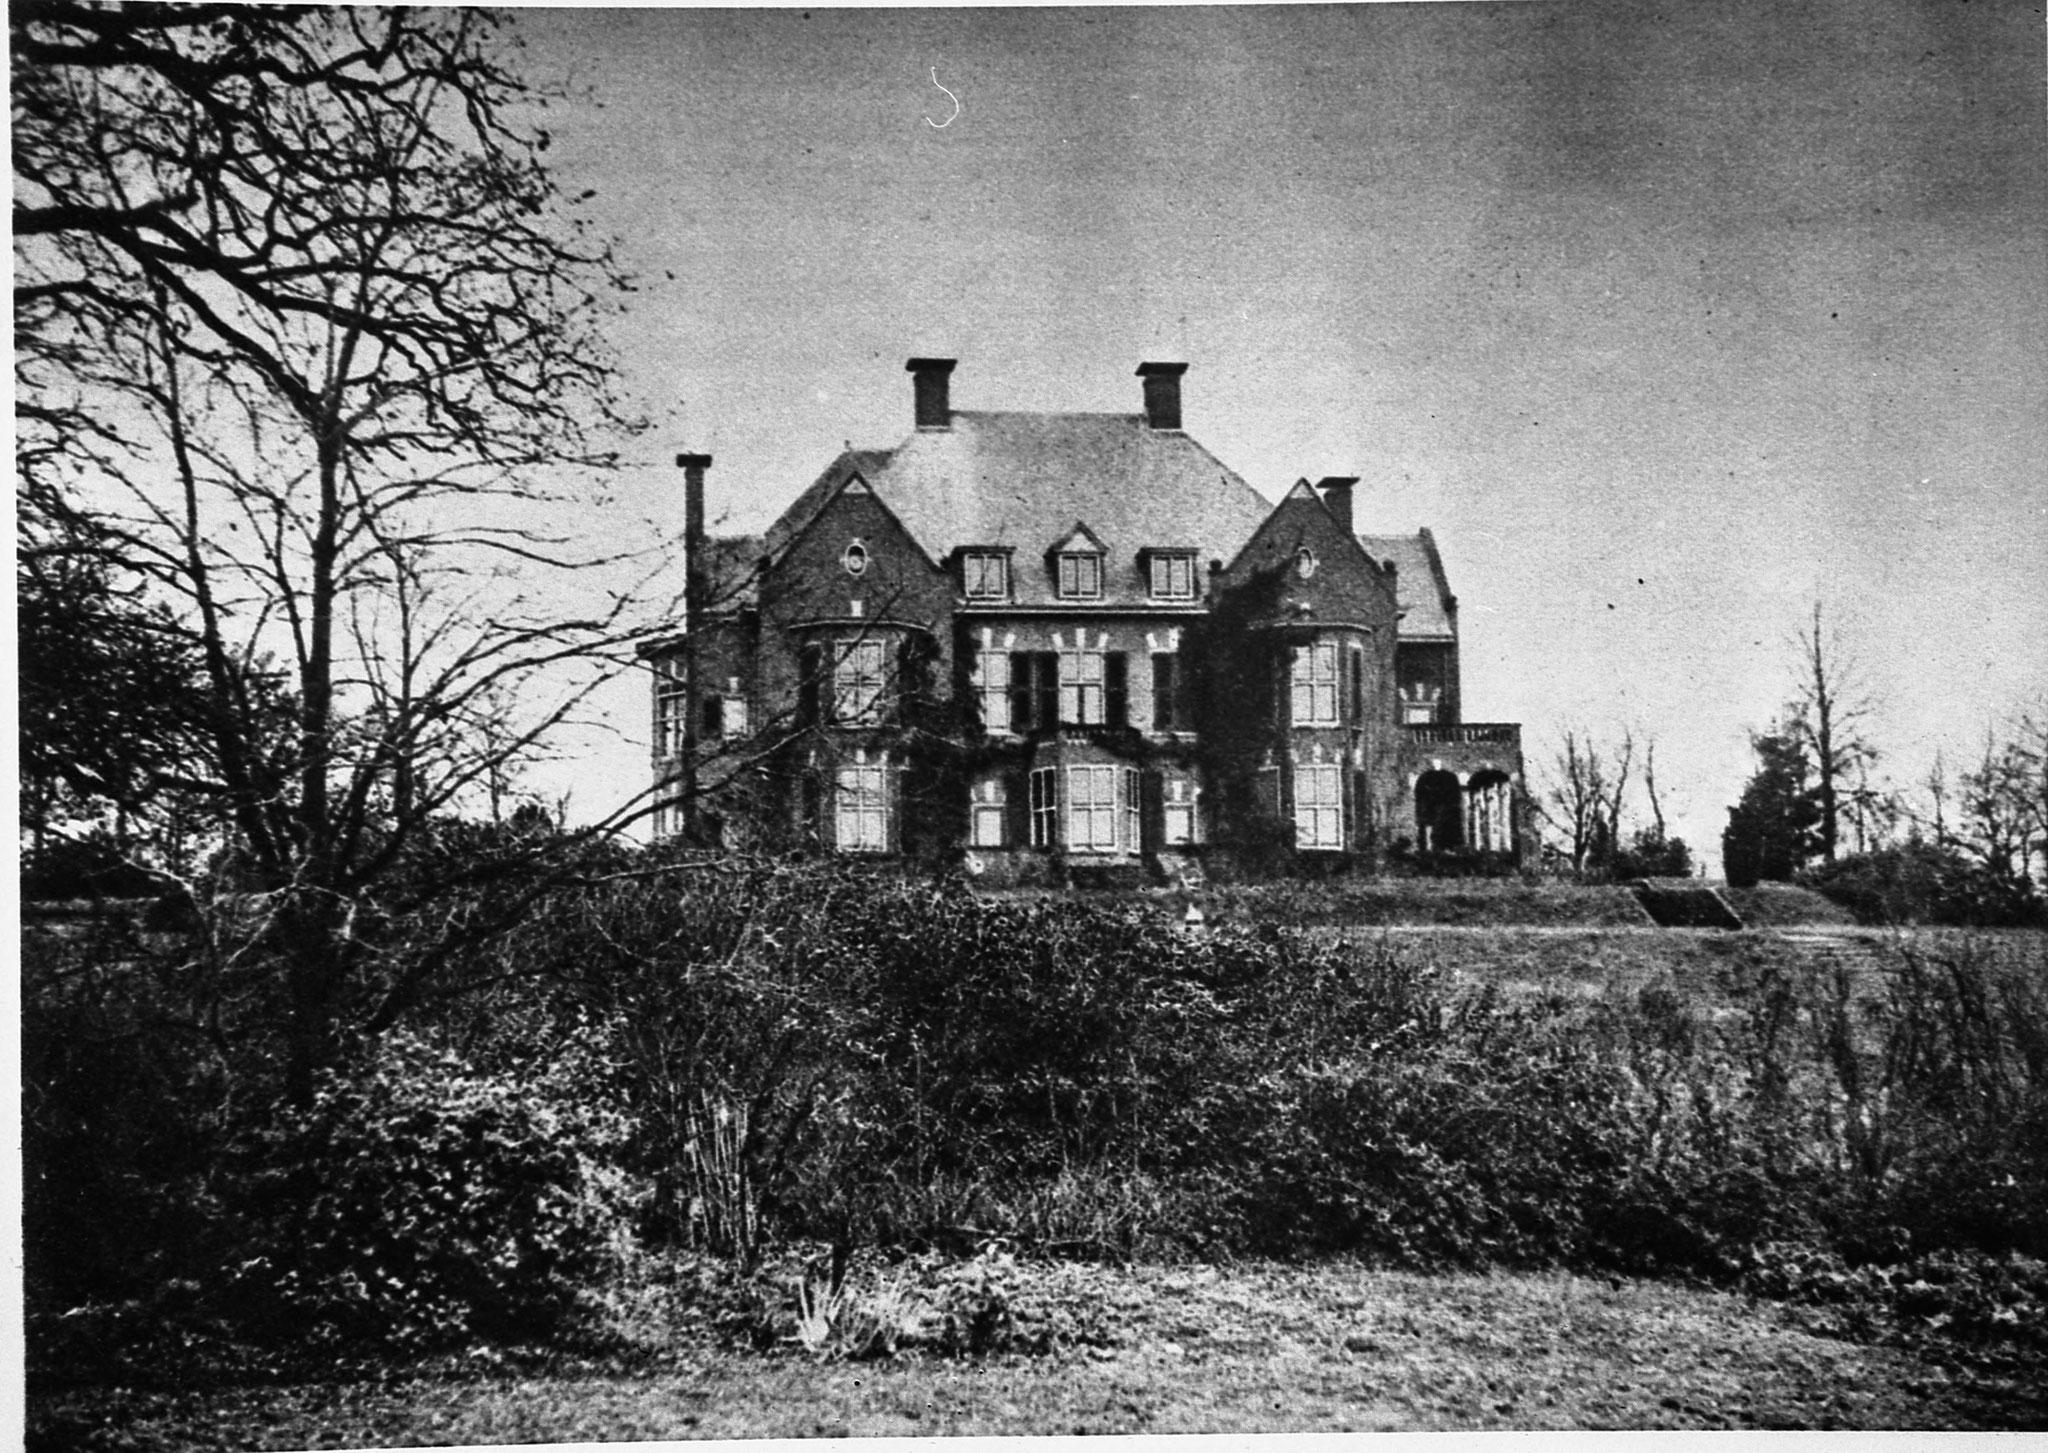 Landhuis Heselbergh, rond 1920. Ontwerp J.W. Hanrath, tuinontwerp L.A. Springer (bron: Gelders Archief).